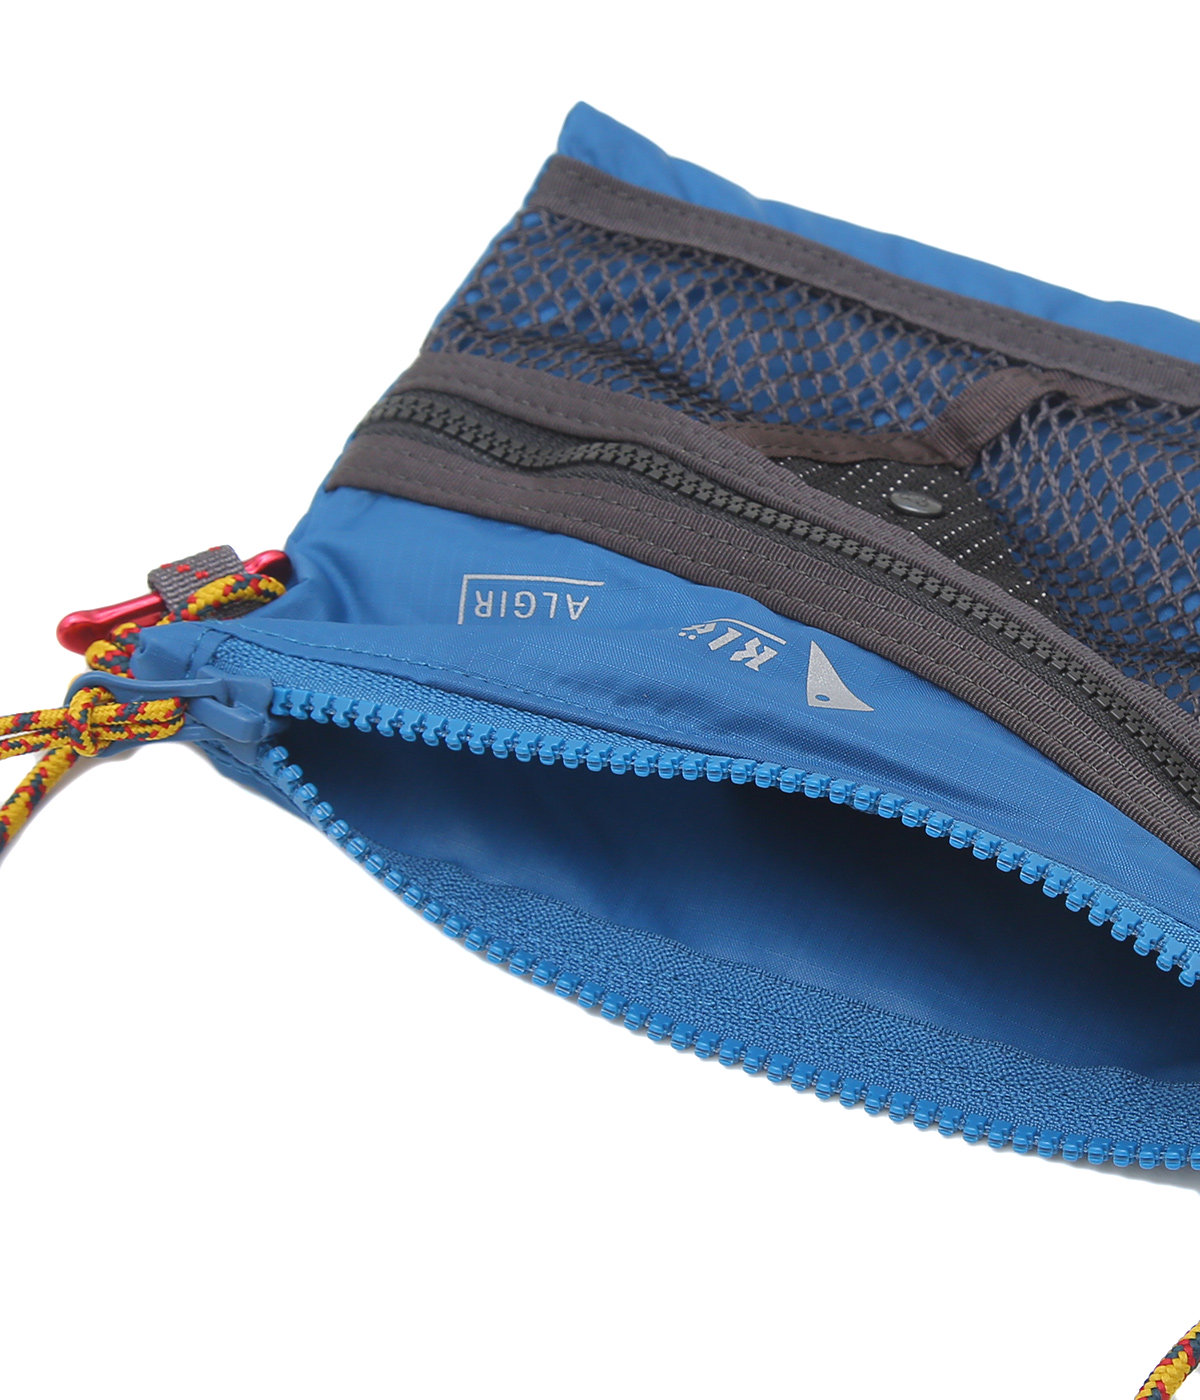 Algir Accessory Bag Small